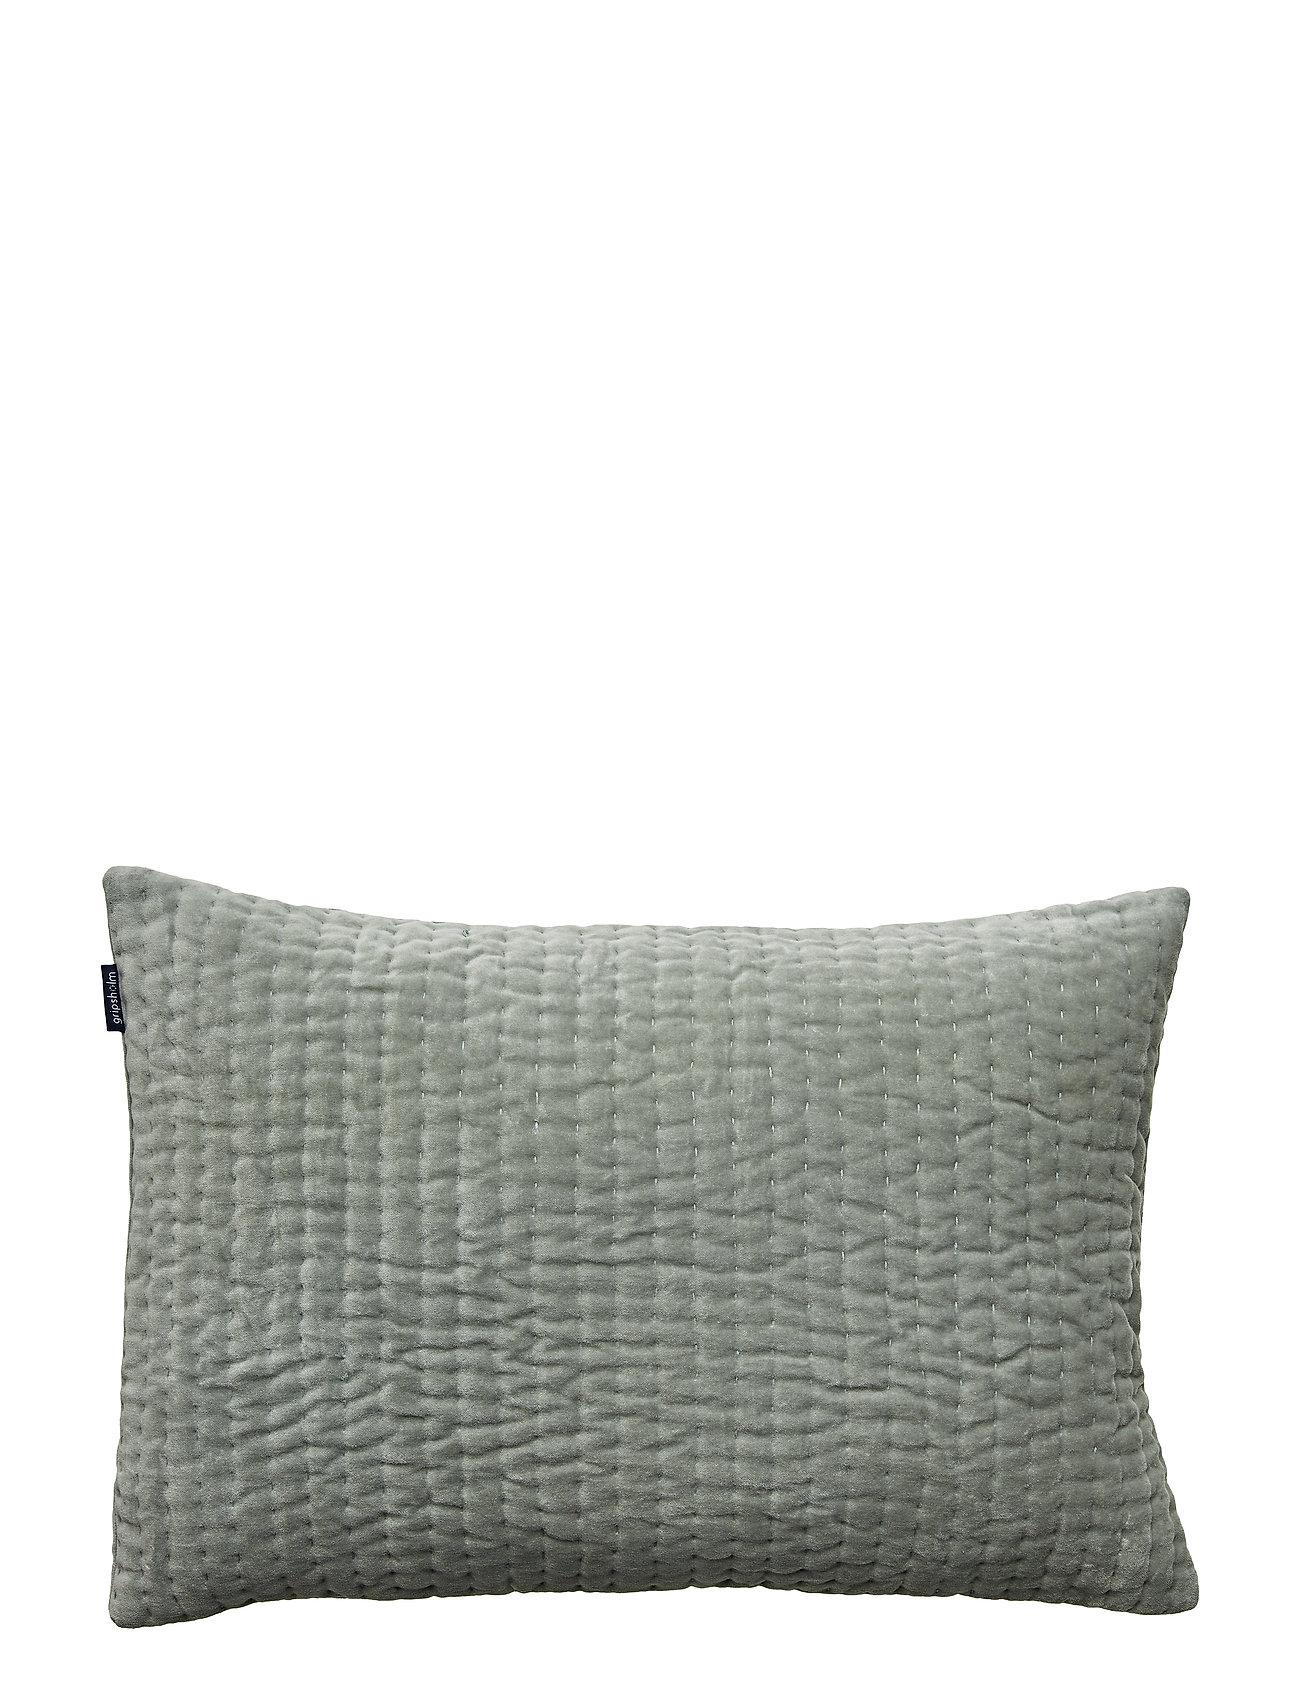 Cushion Cover GrayGripsholm Elliot Gotsaqua Elliot Cover Cushion dhQsrt